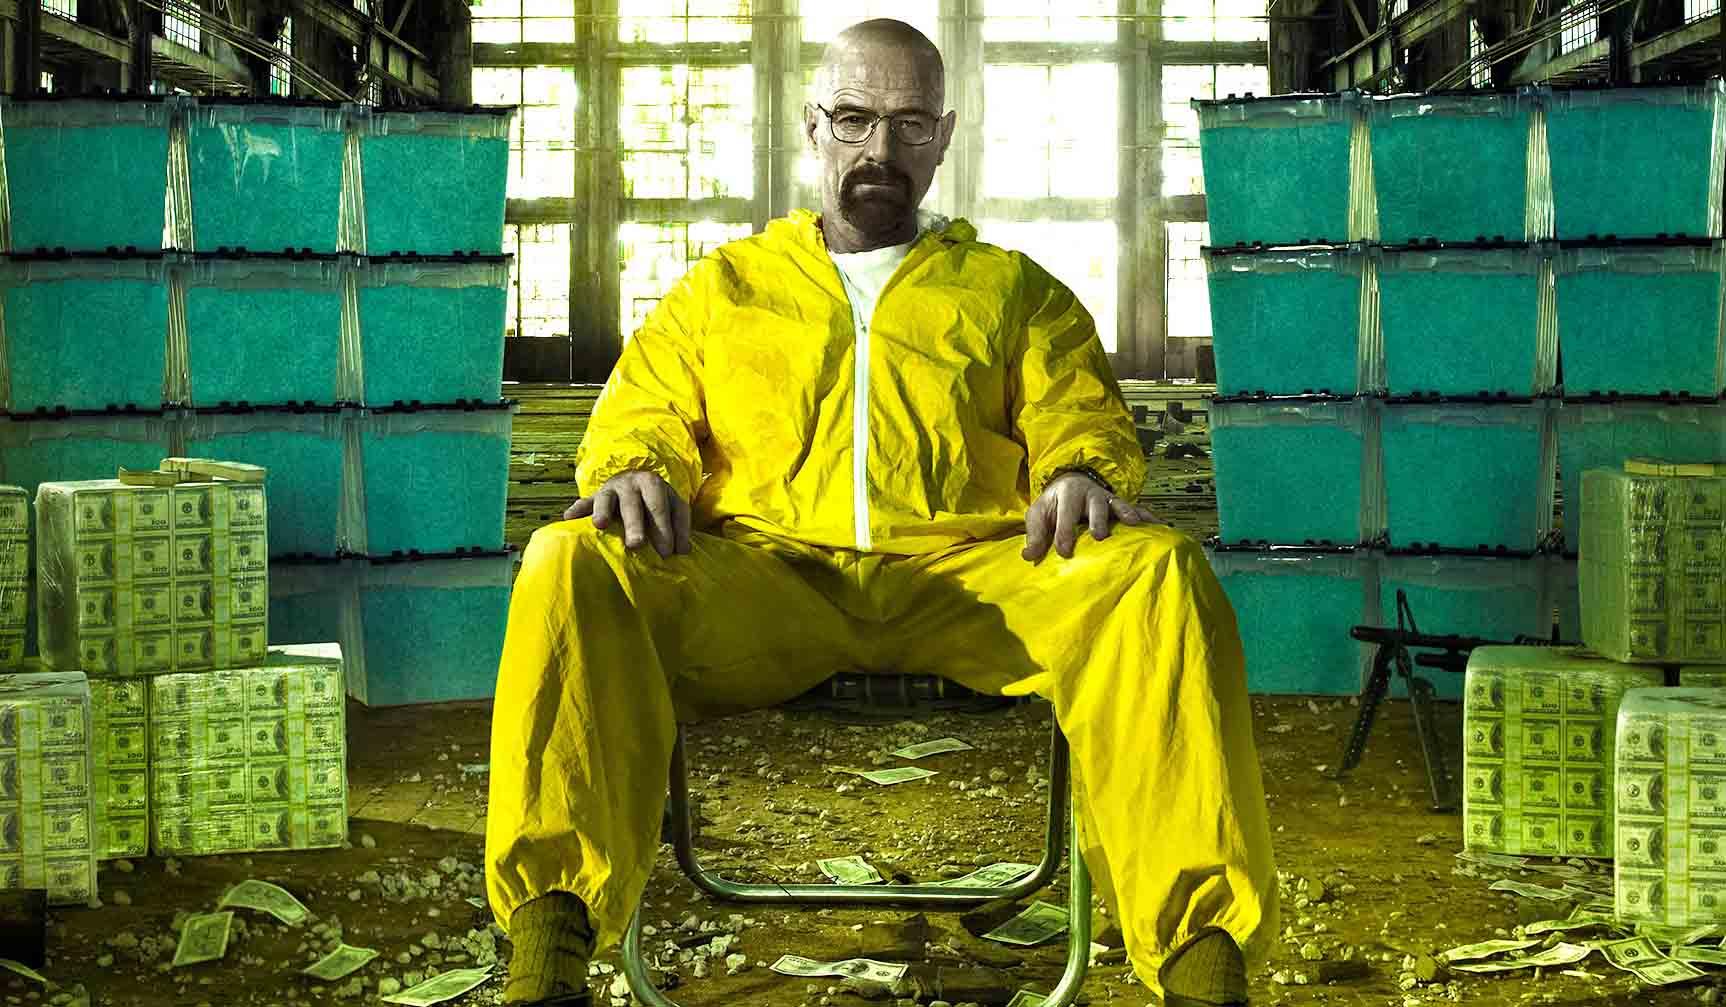 Foto: Breaking Bad, Walter White - Heisenberg